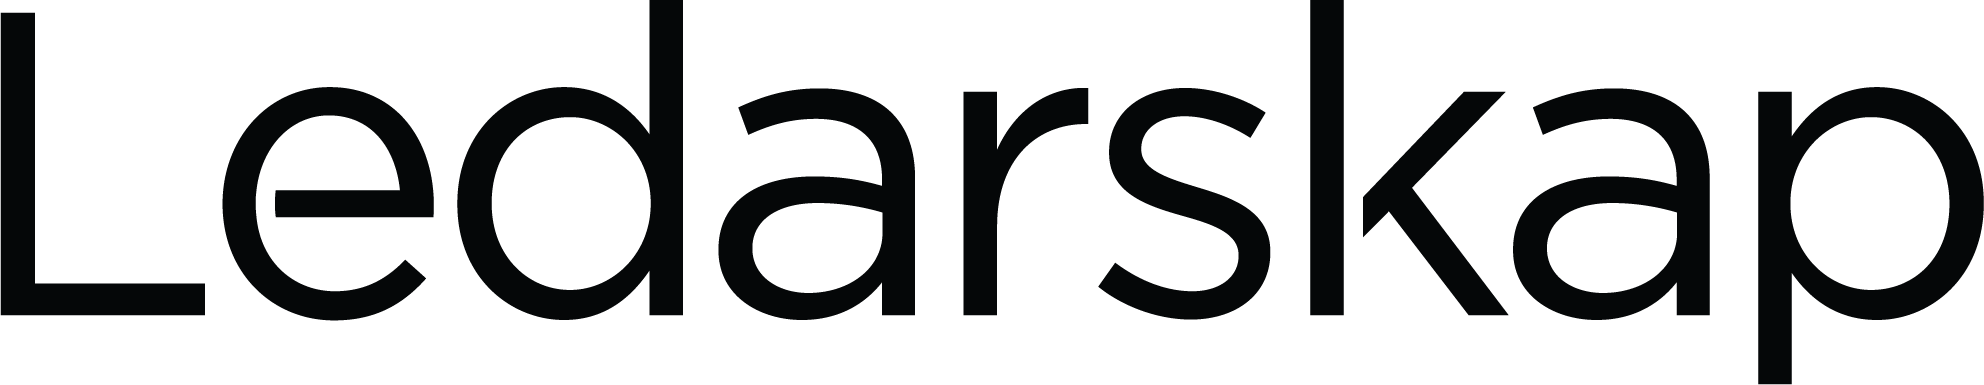 Ledarskap - Logo Black